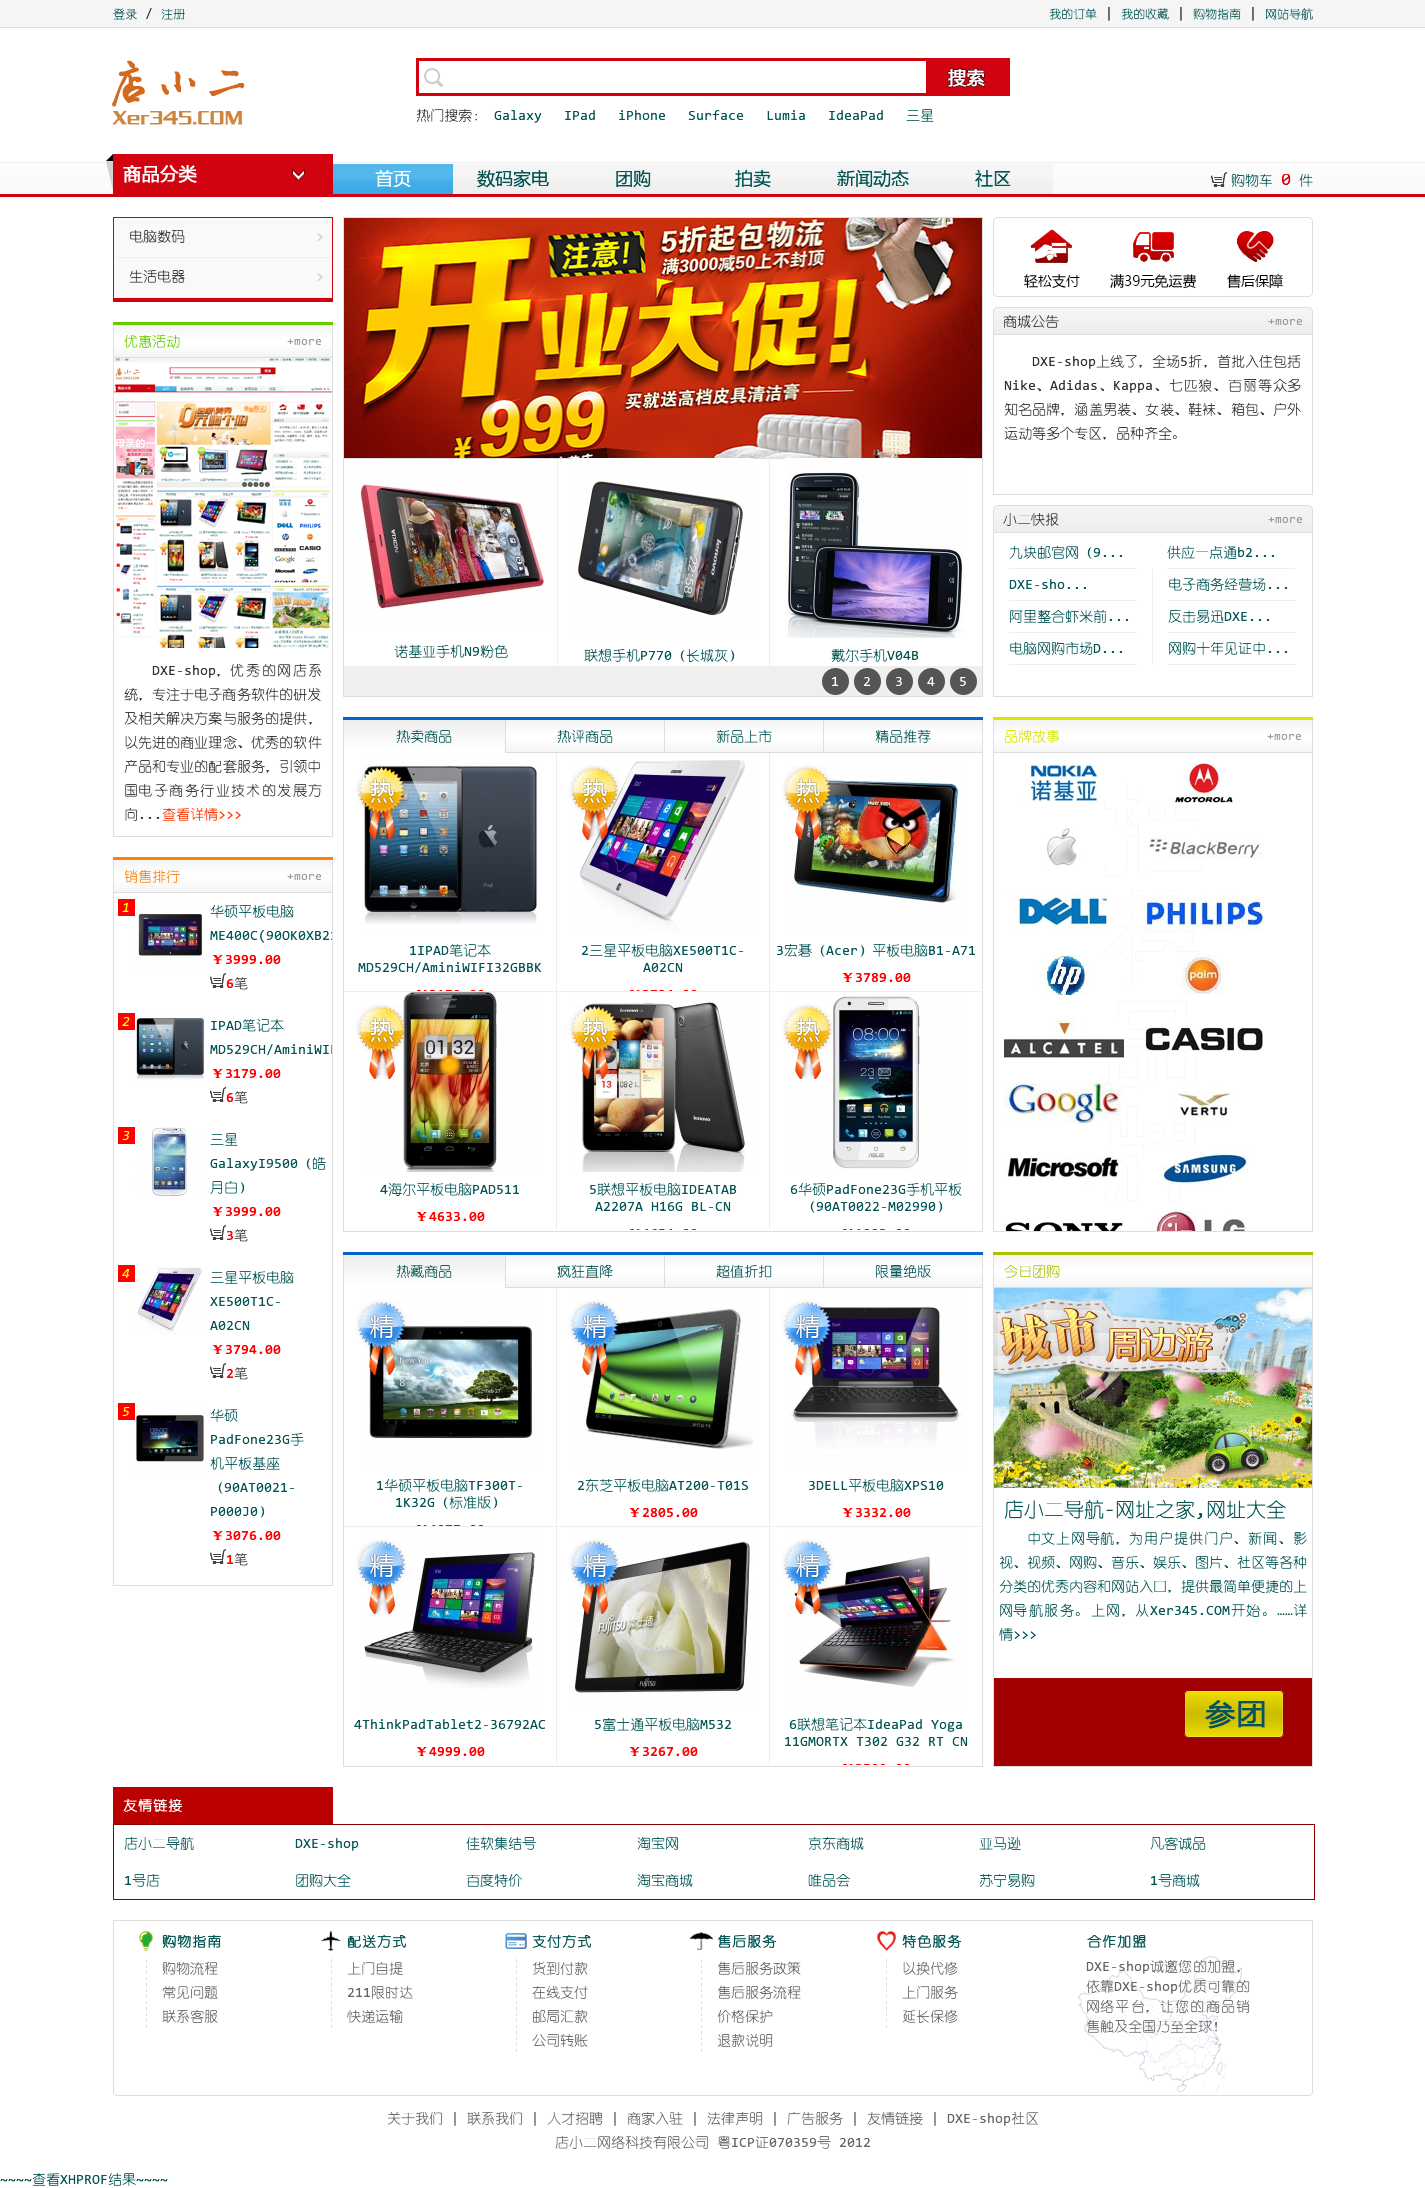 DXE-shop网店系统,是一套基于PHP+MySQL技术开发的网上购物系统